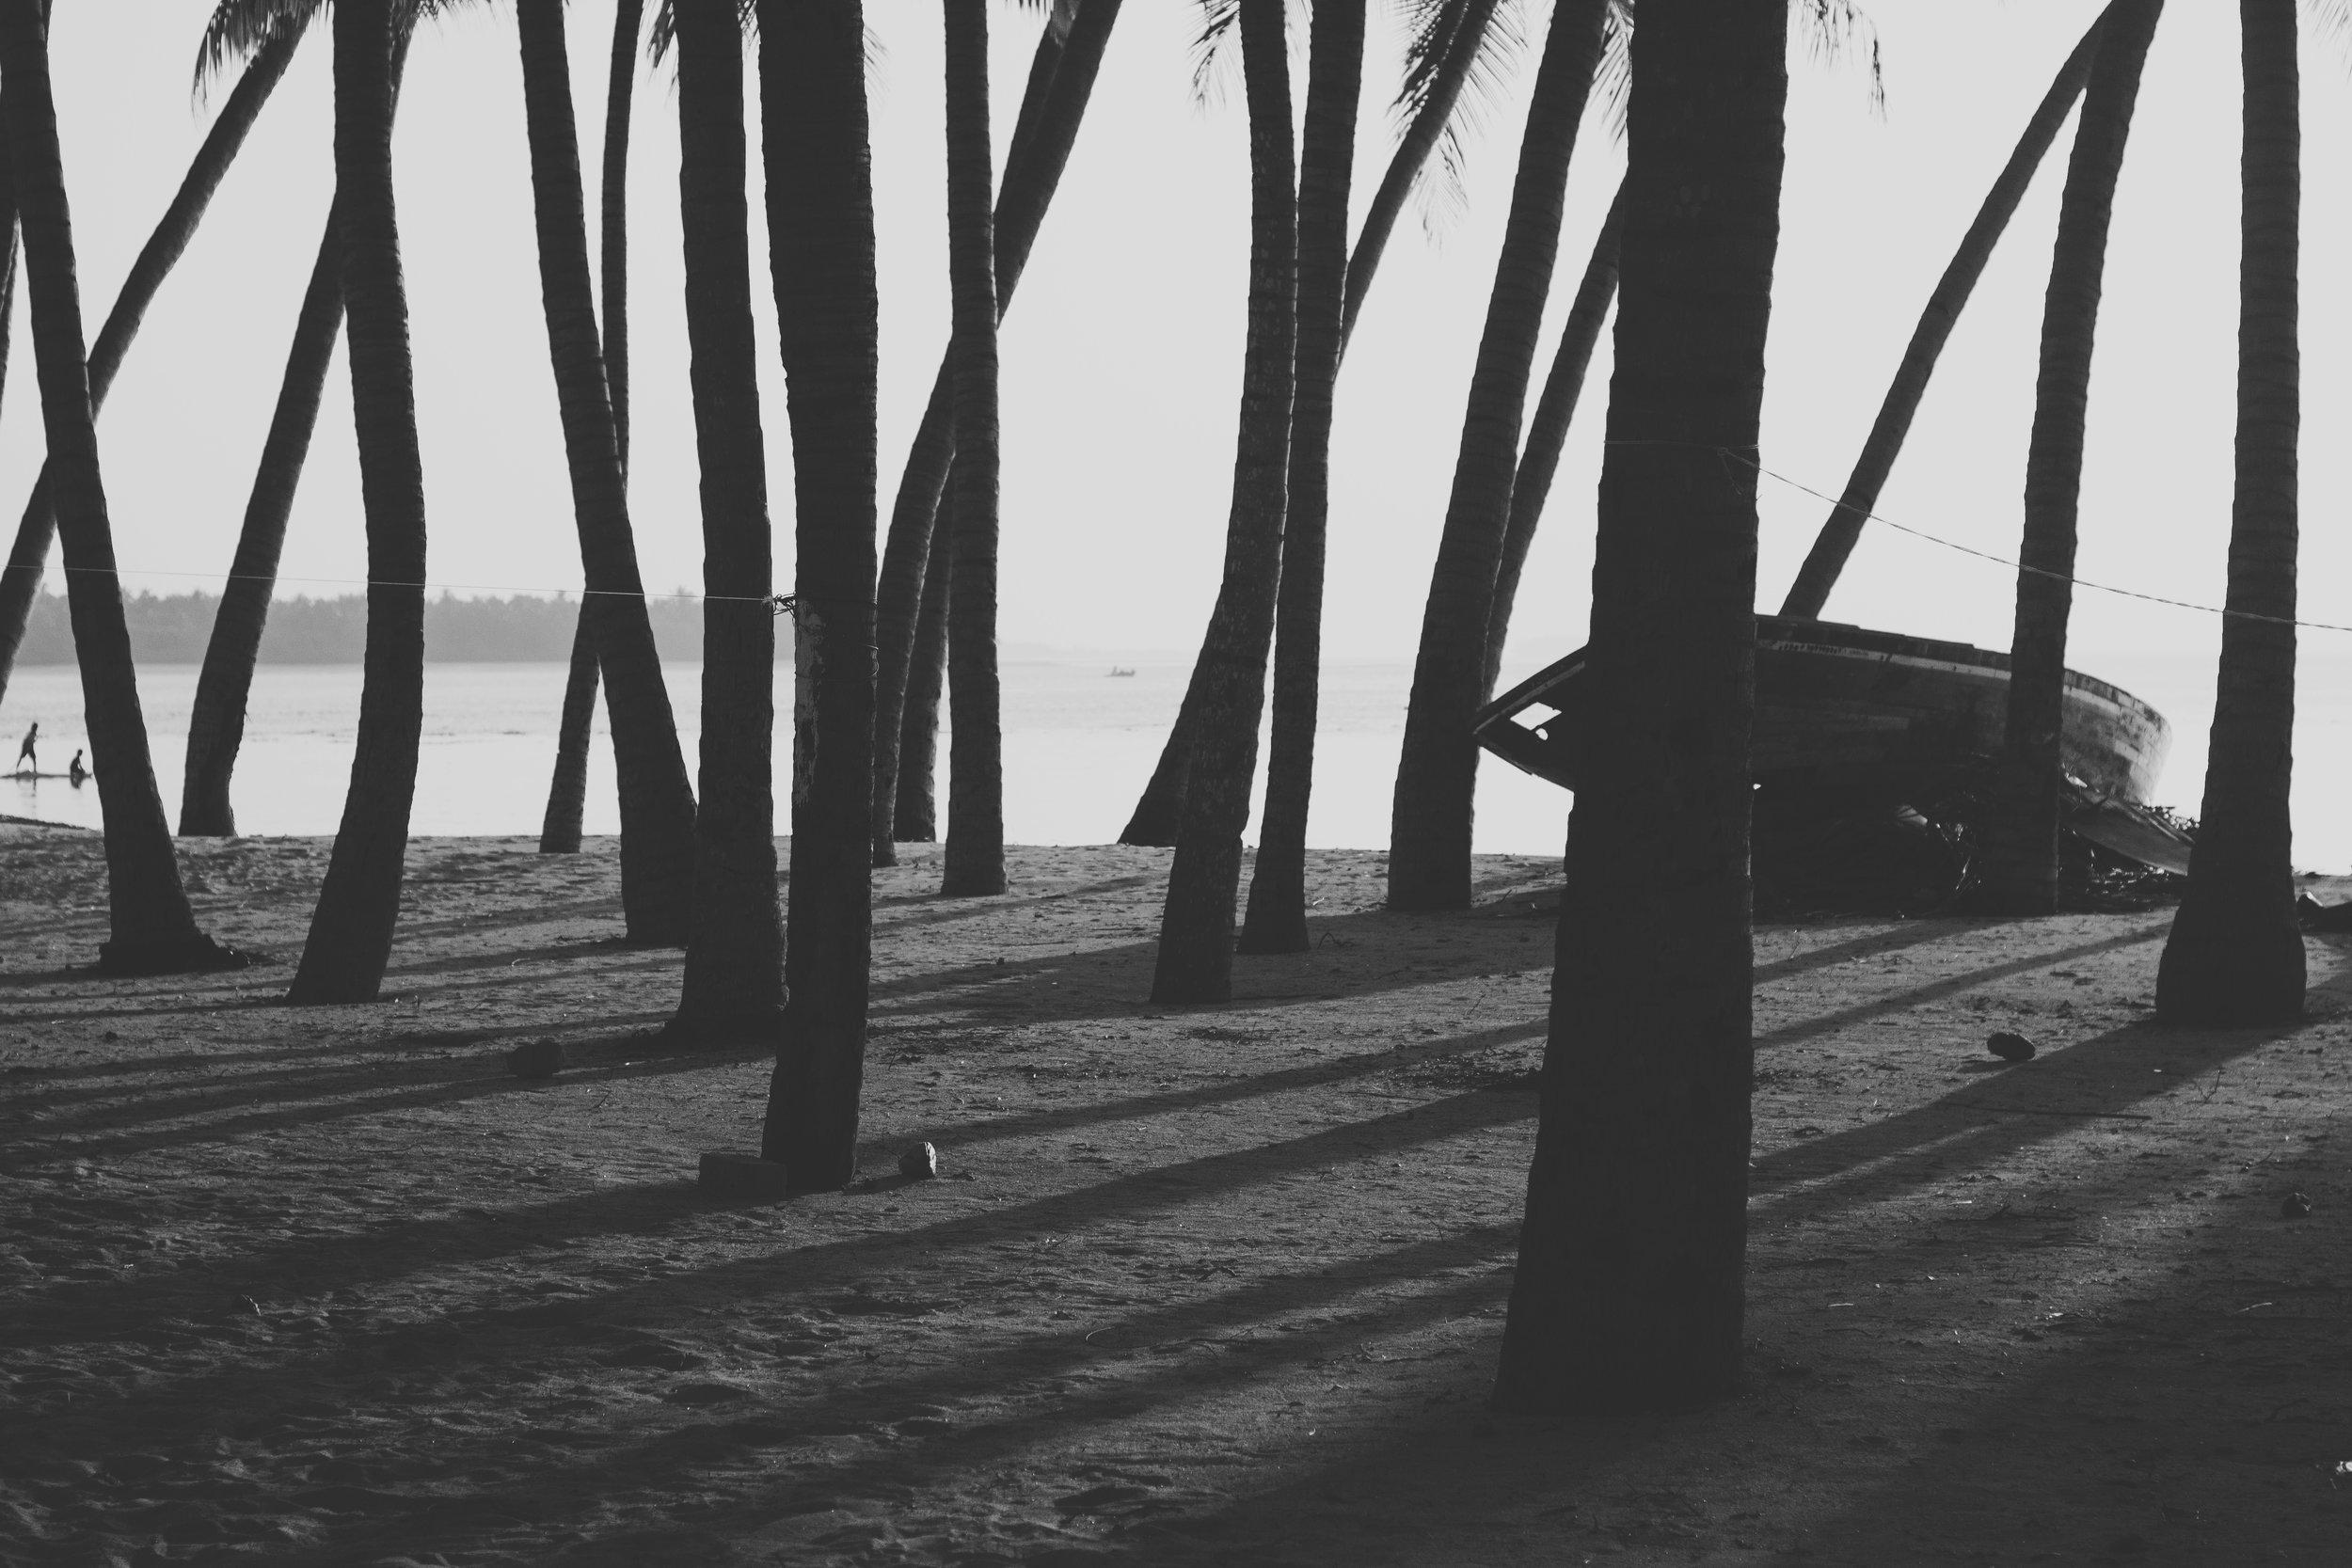 Baa Atoll Eydhafushi, Maldives. Nikon D3100 with Nikon 50mm f/1.8 AF-D. (2013)